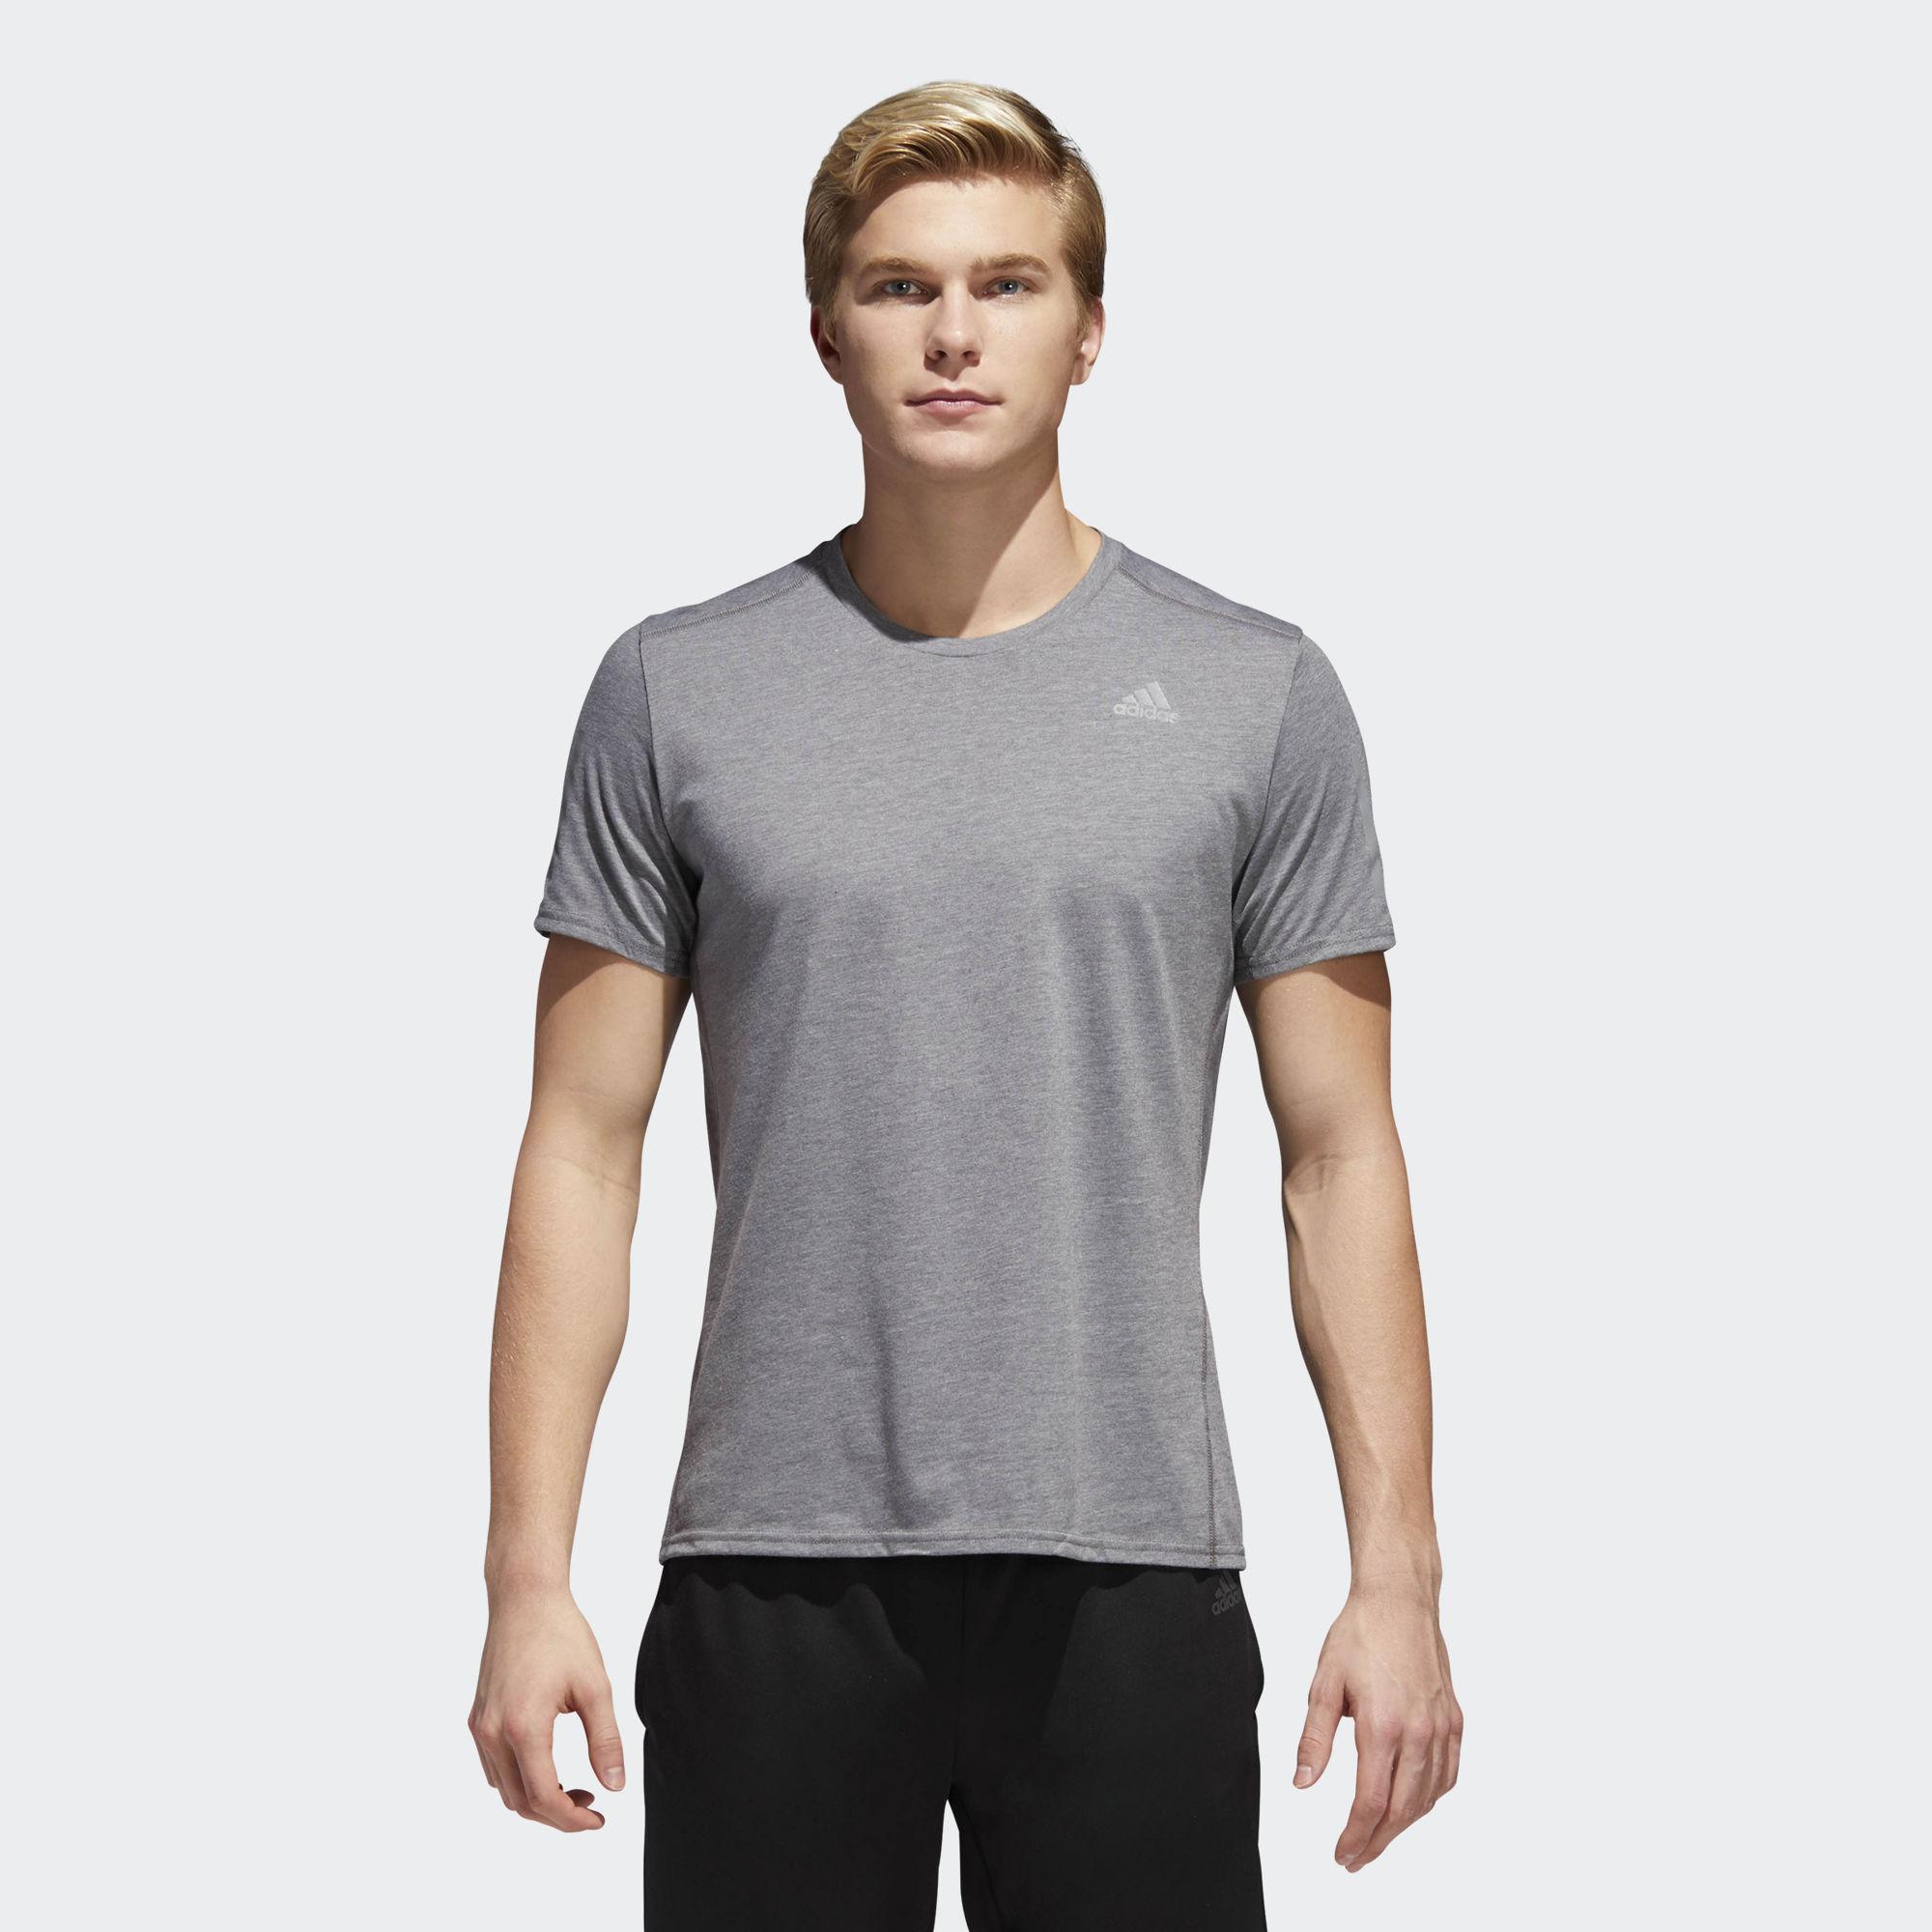 adidas Response Soft Short Sleeve Tee in Grau